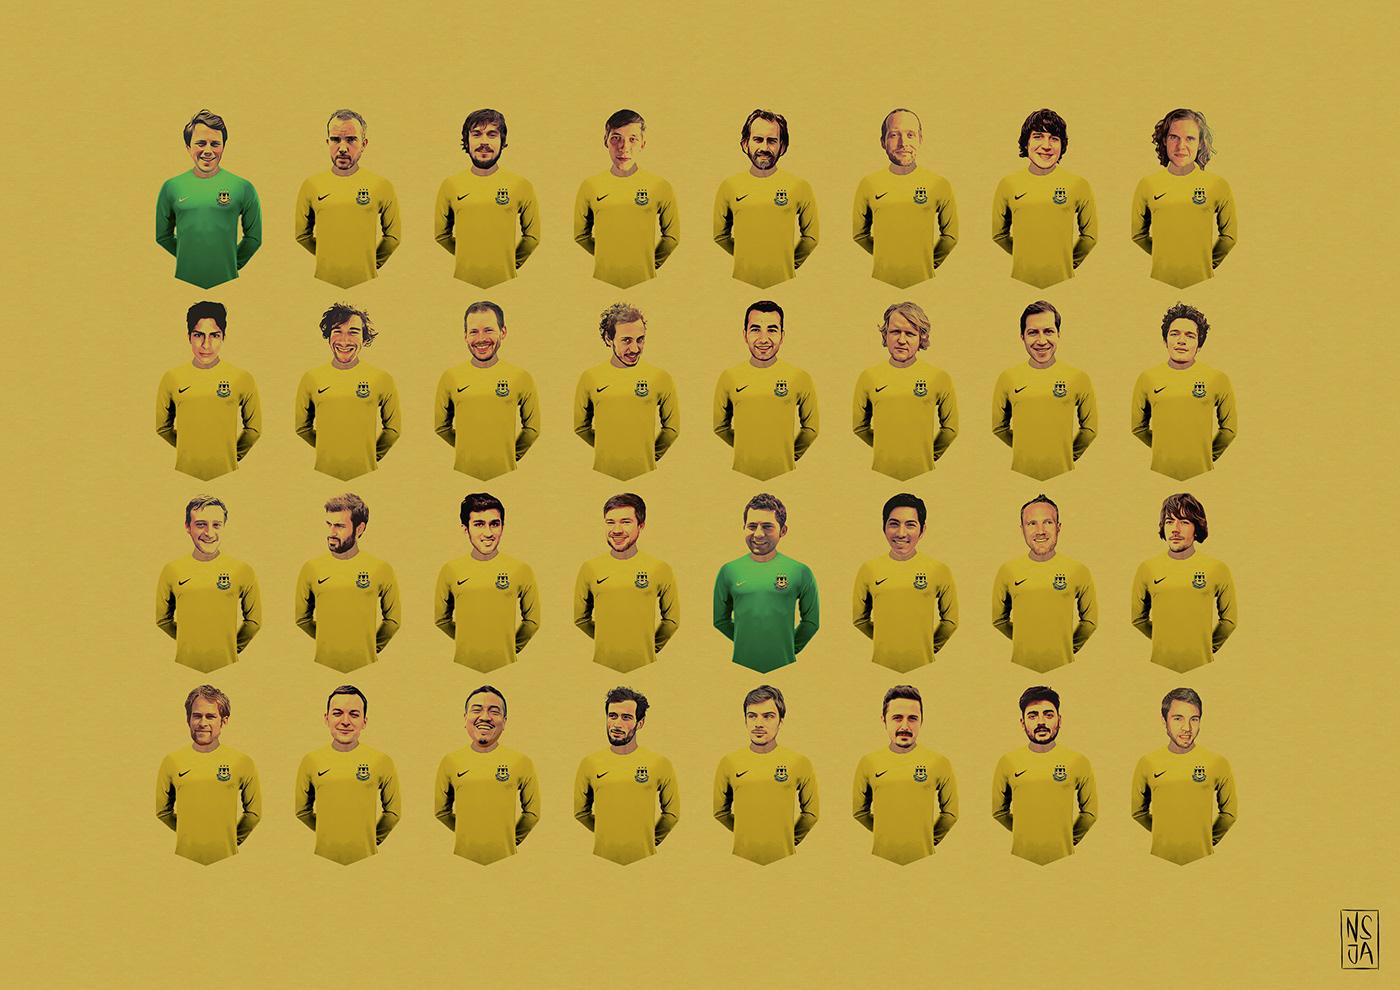 nsjatkinson,graphic design ,ILLUSTRATION ,Character design ,branding ,identity,player graphics,football,berlin,digital media